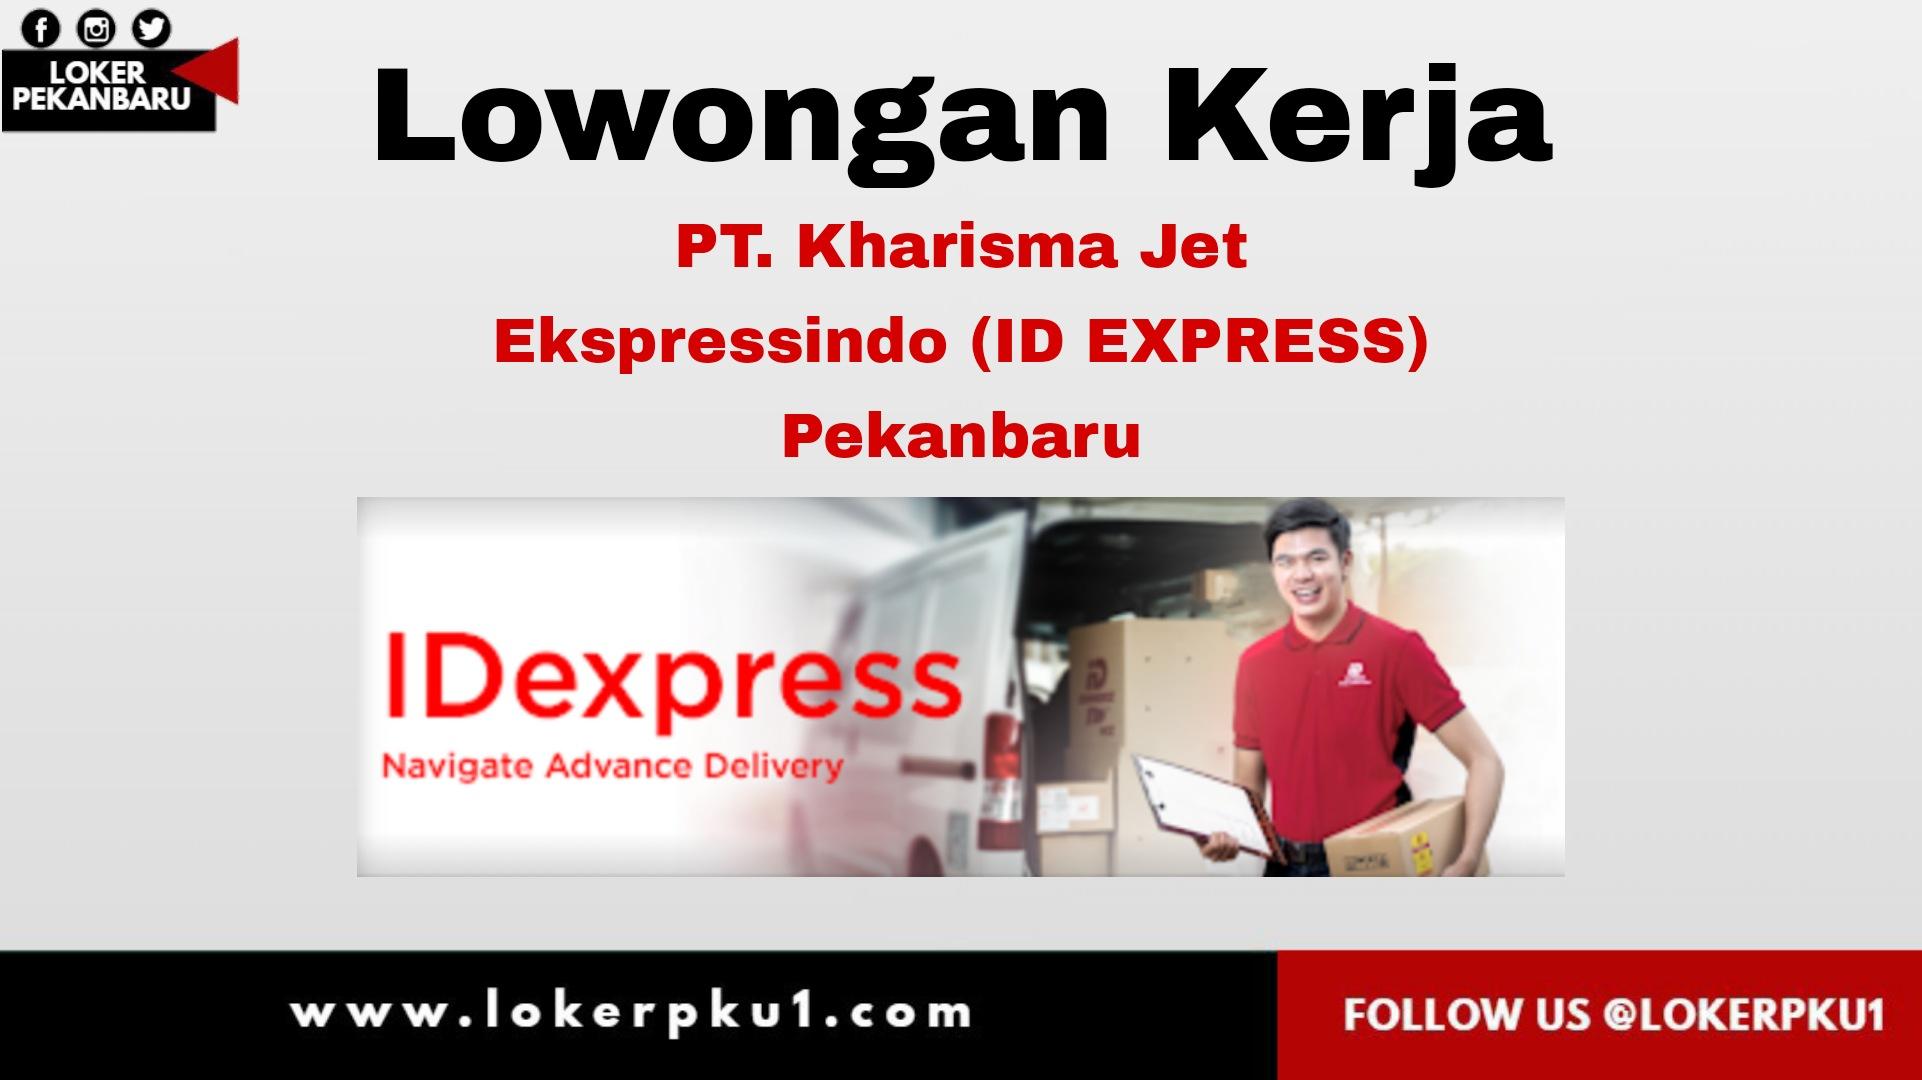 Lowongan Kerja Pt Kharisma Jet Ekspressindo Id Express Pekanbaru Februari 2021